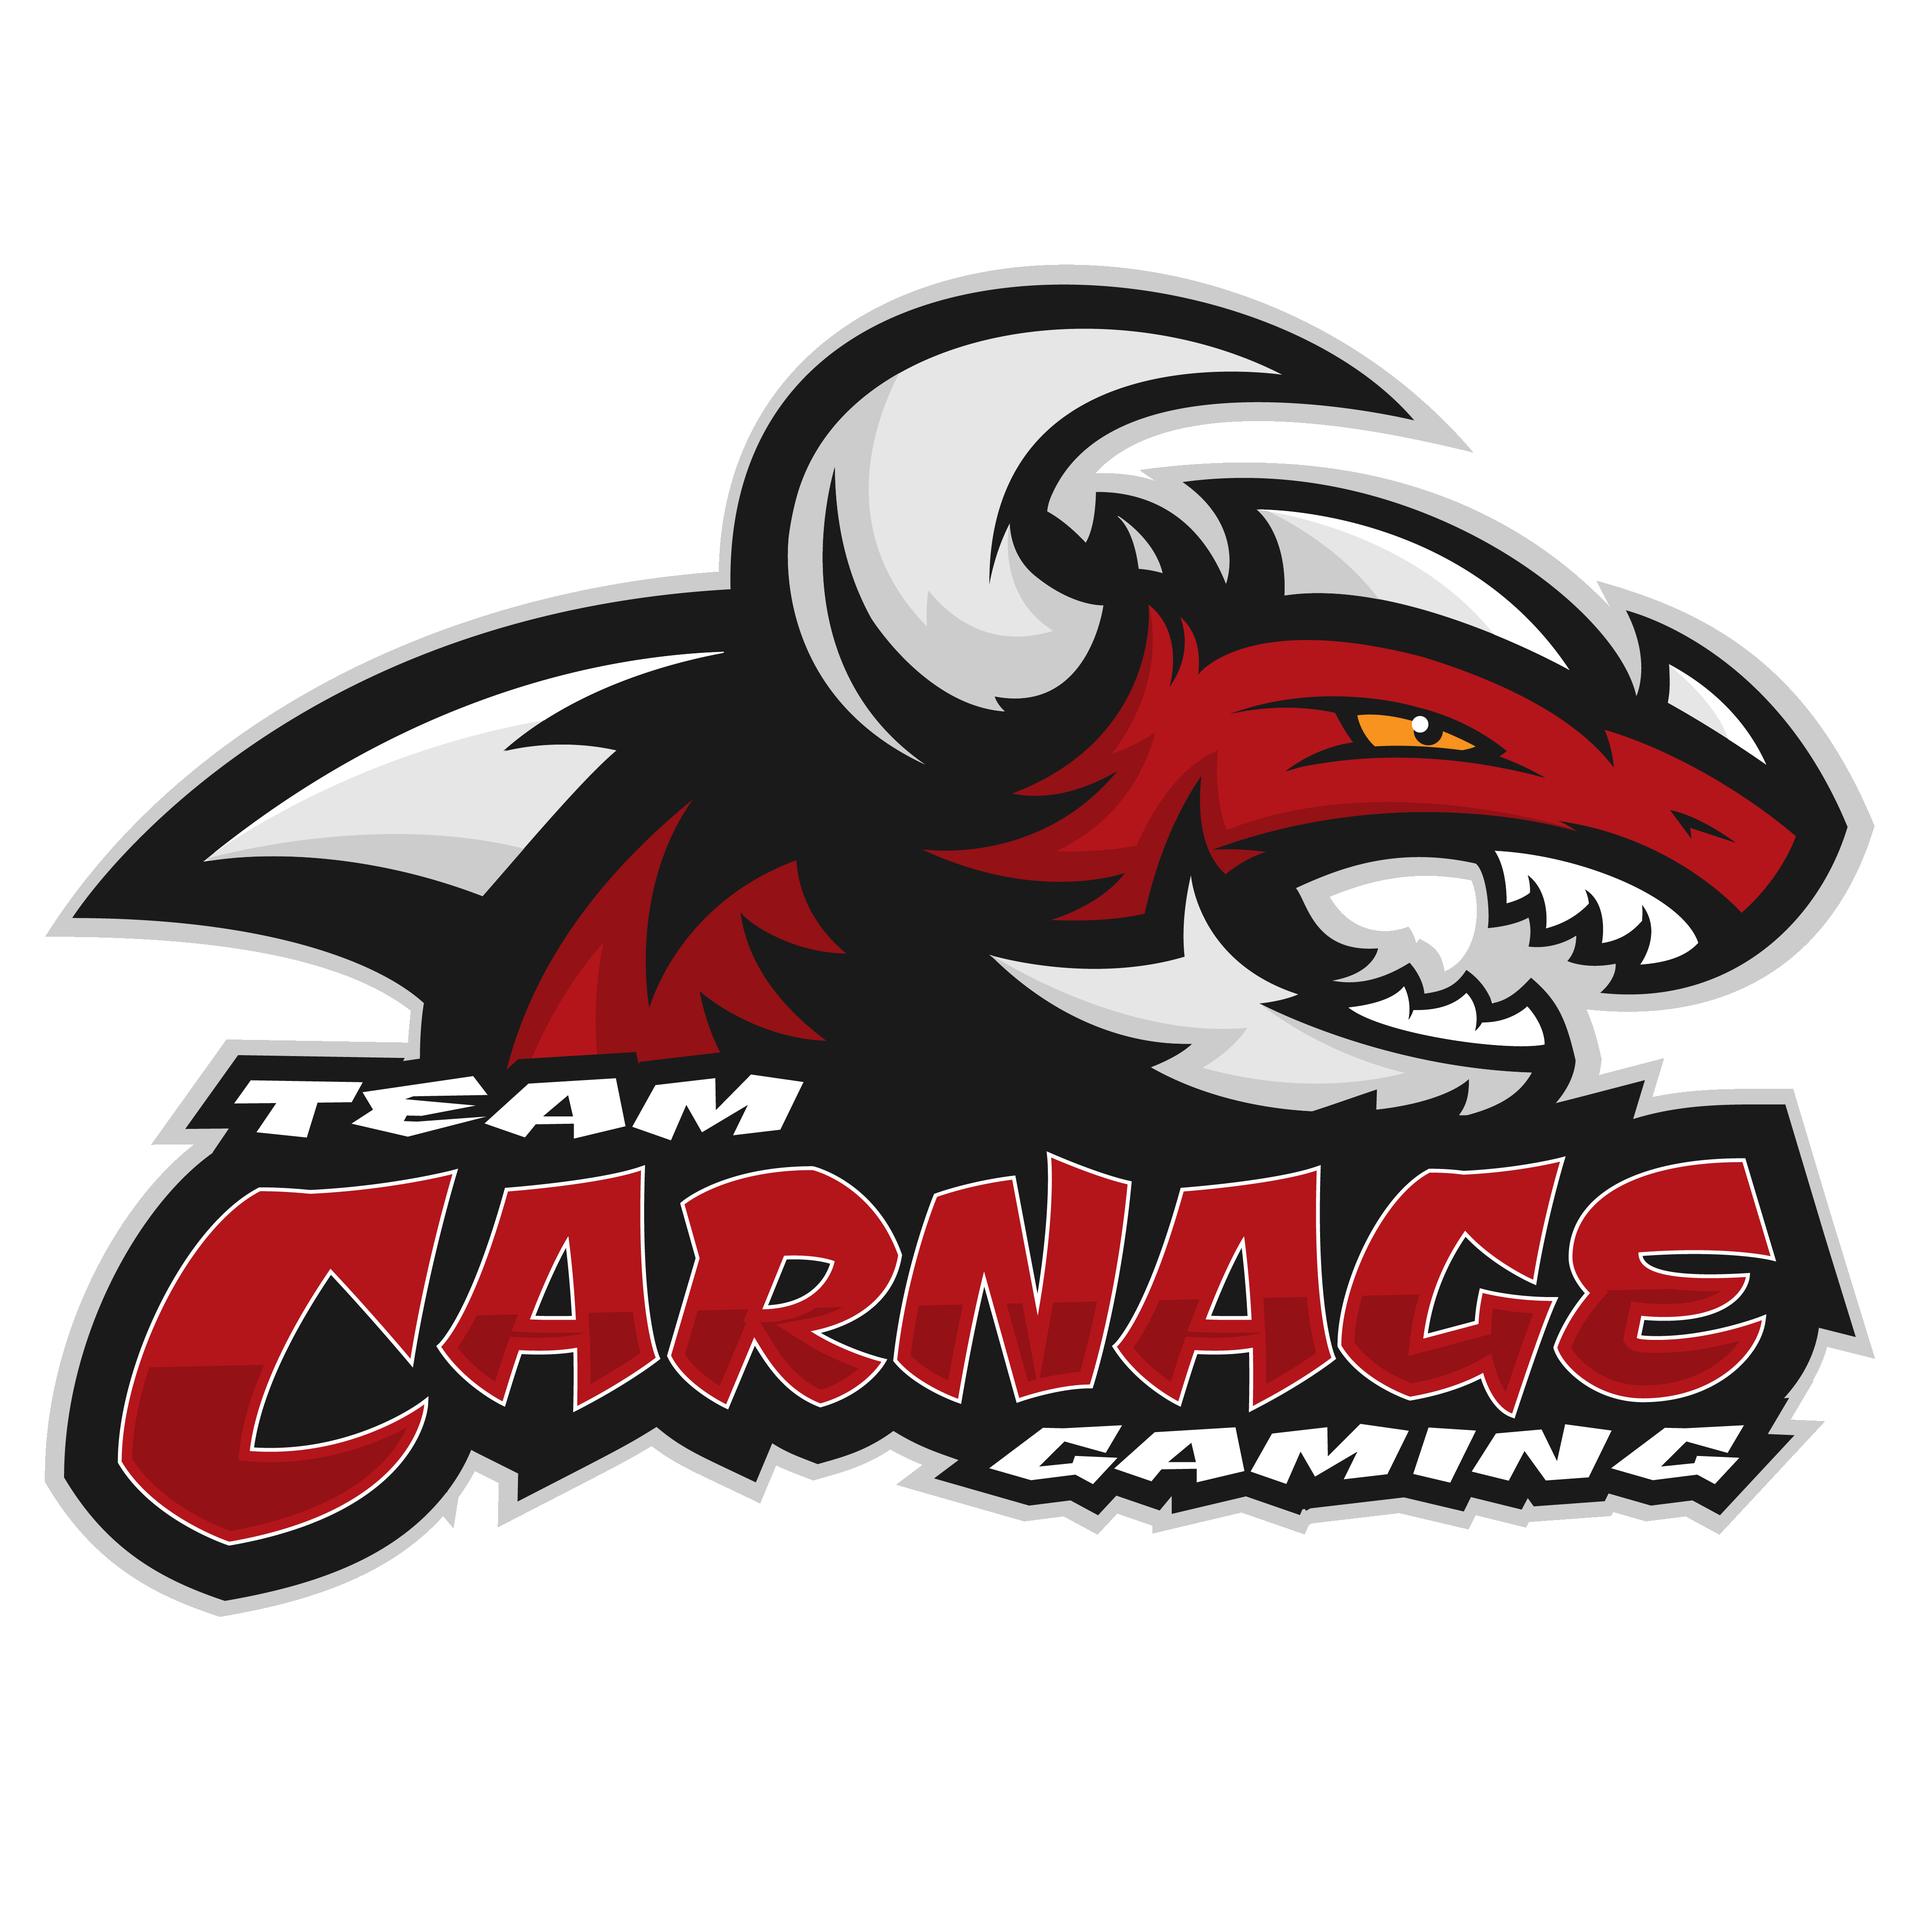 Official Team Carnage Gaming logo